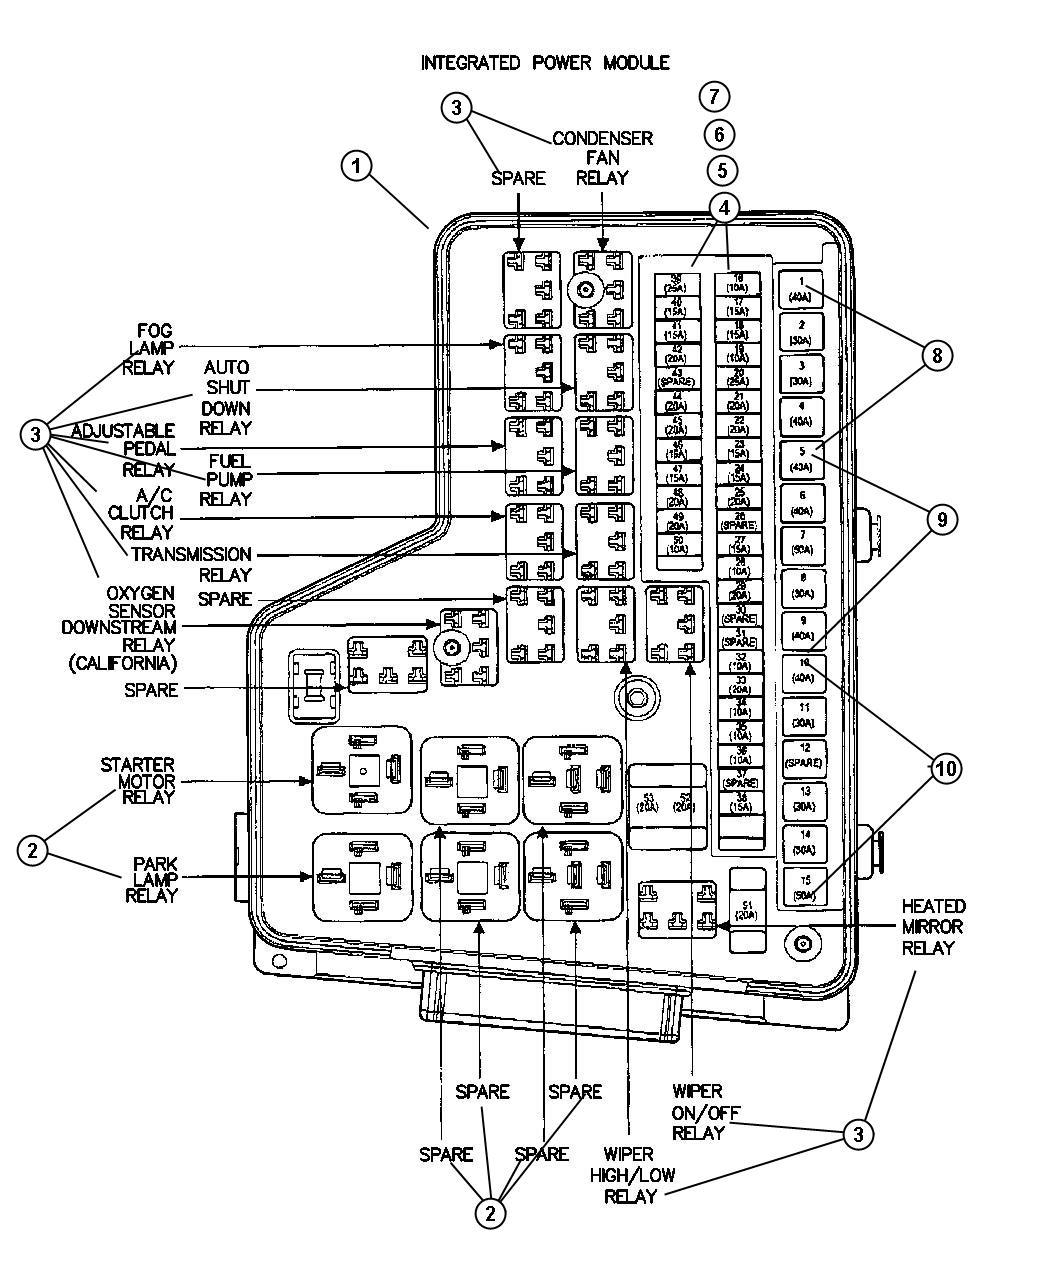 Impulse Electric Ke Controller Wiring Diagram,Electric ... on